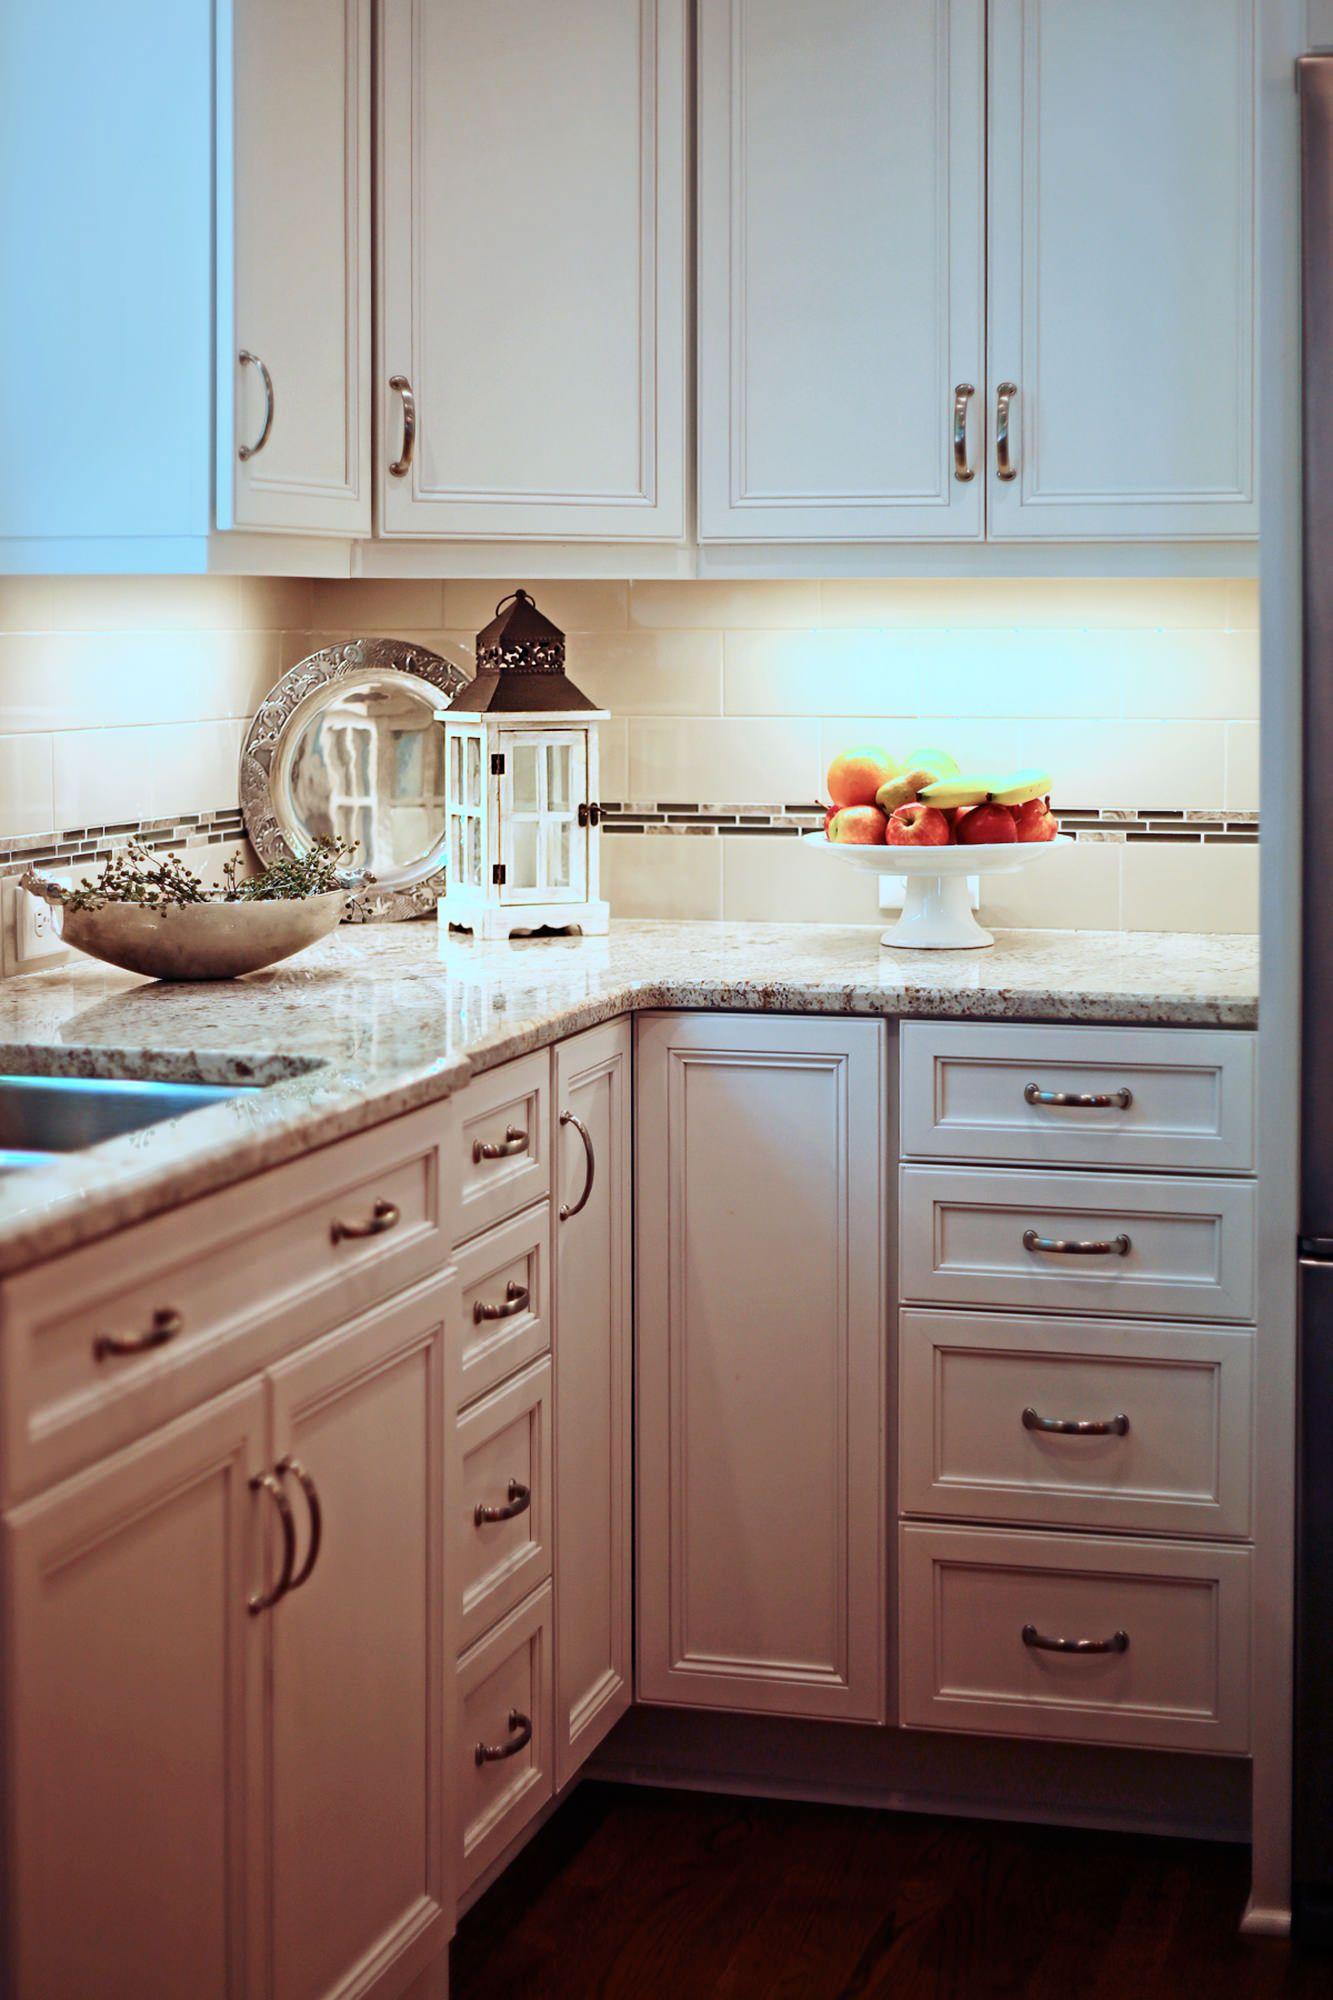 Barham Kitchen North Carolina Kitchen Remodeling Services Marsh